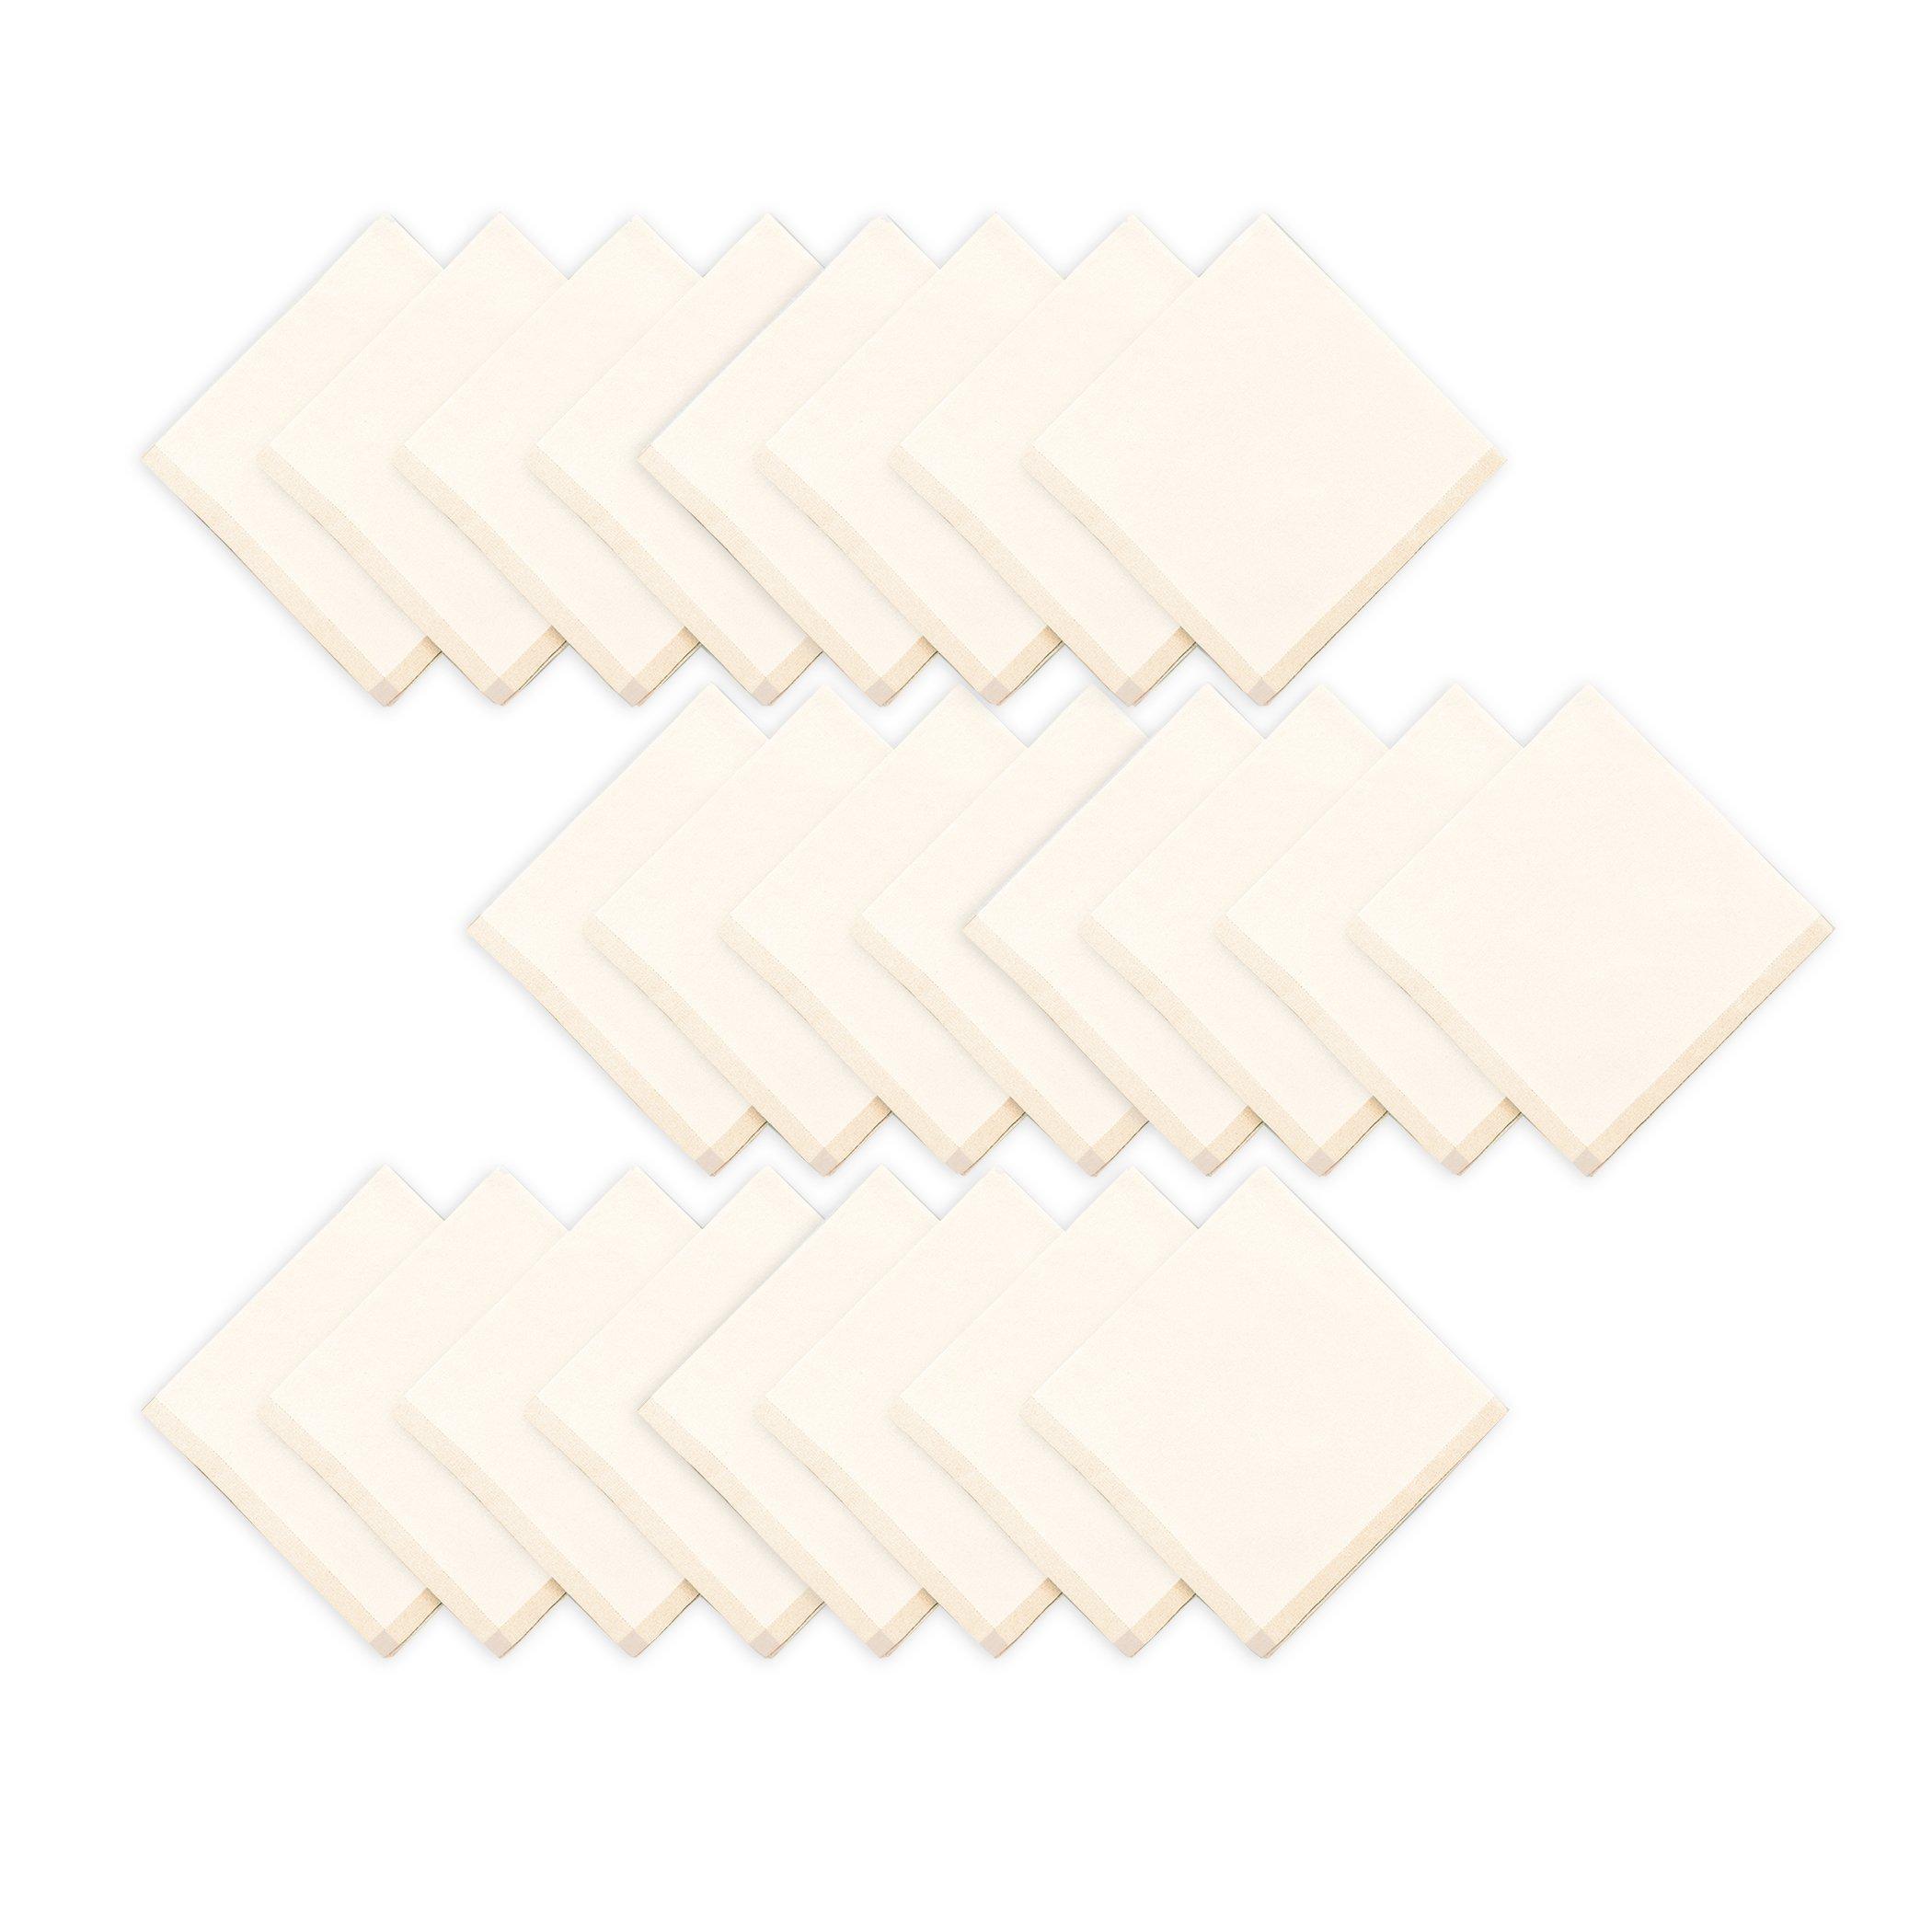 Elrene Home Fashions Everyday Cotton Napkin Machine Washable, 18''x18'' (Set of 24), Natural